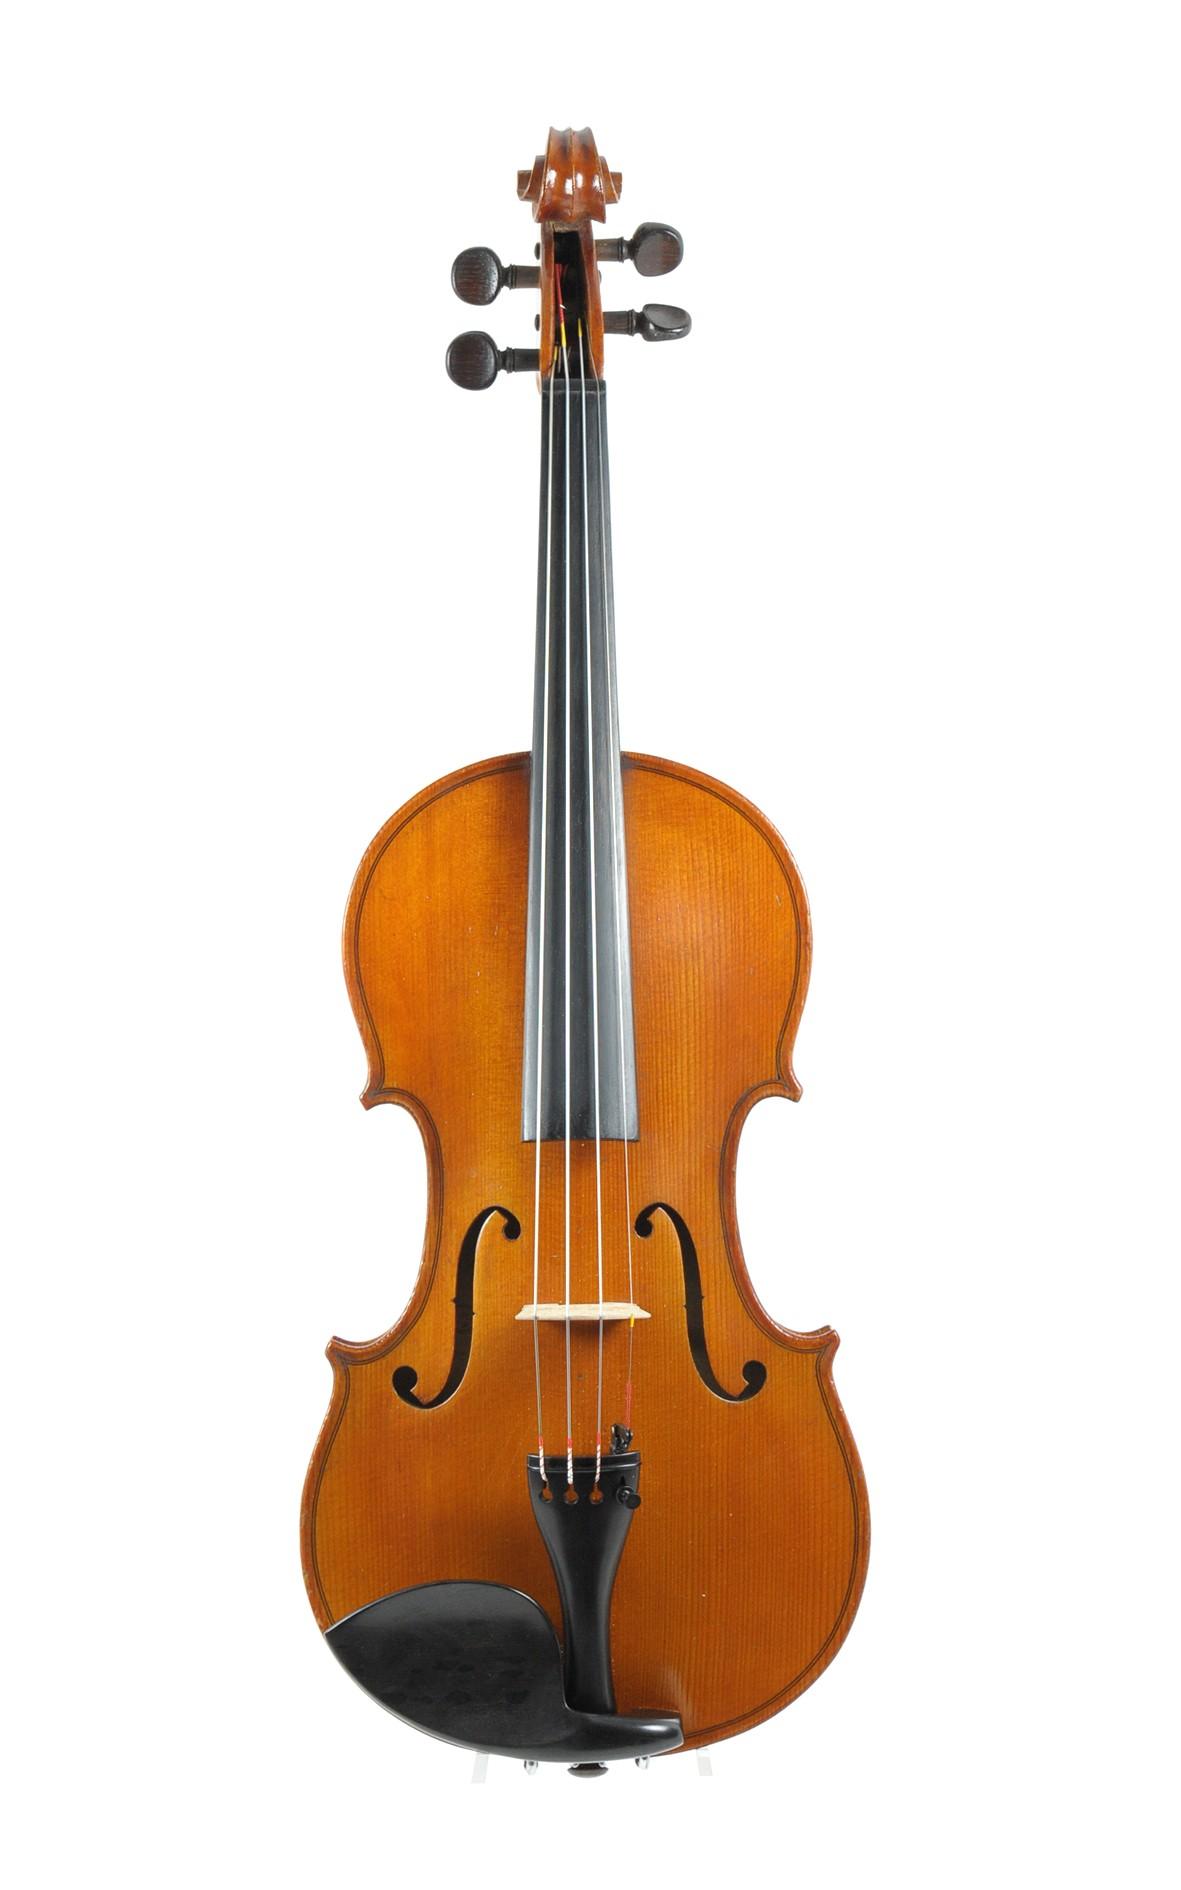 7/8 violin, Mirecourt